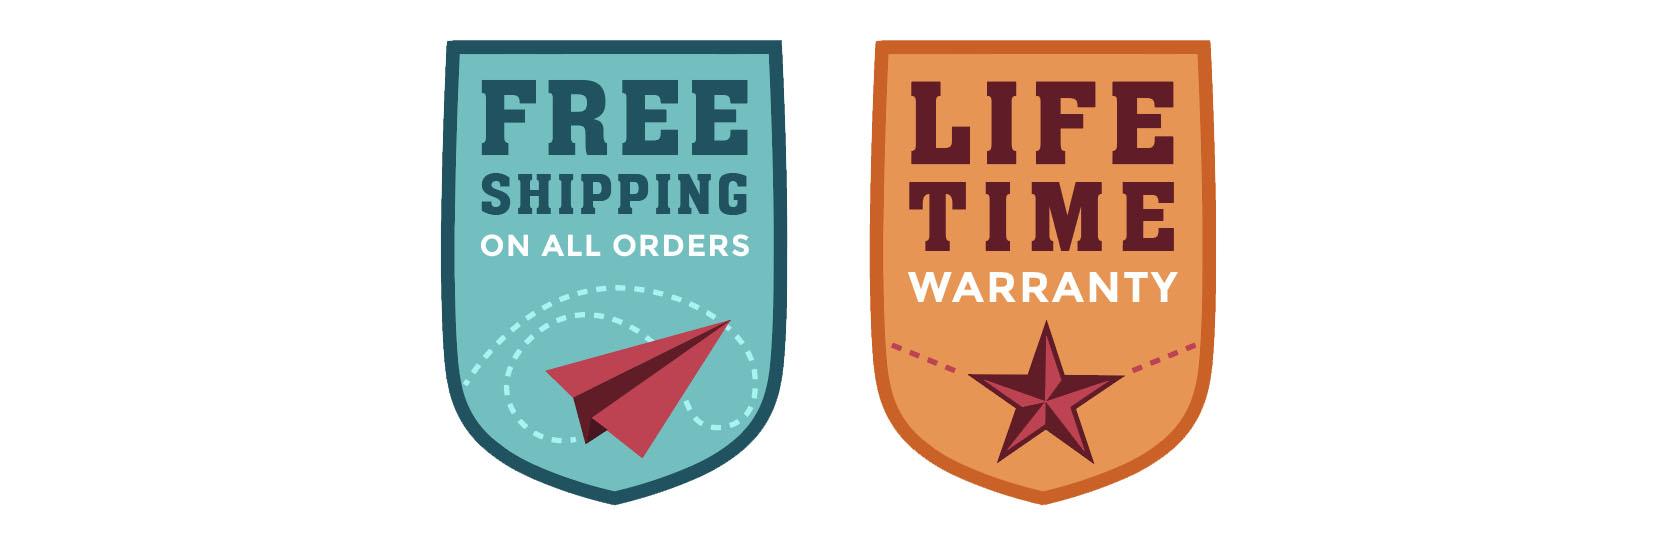 Paria Outdoor Products Warranty Information